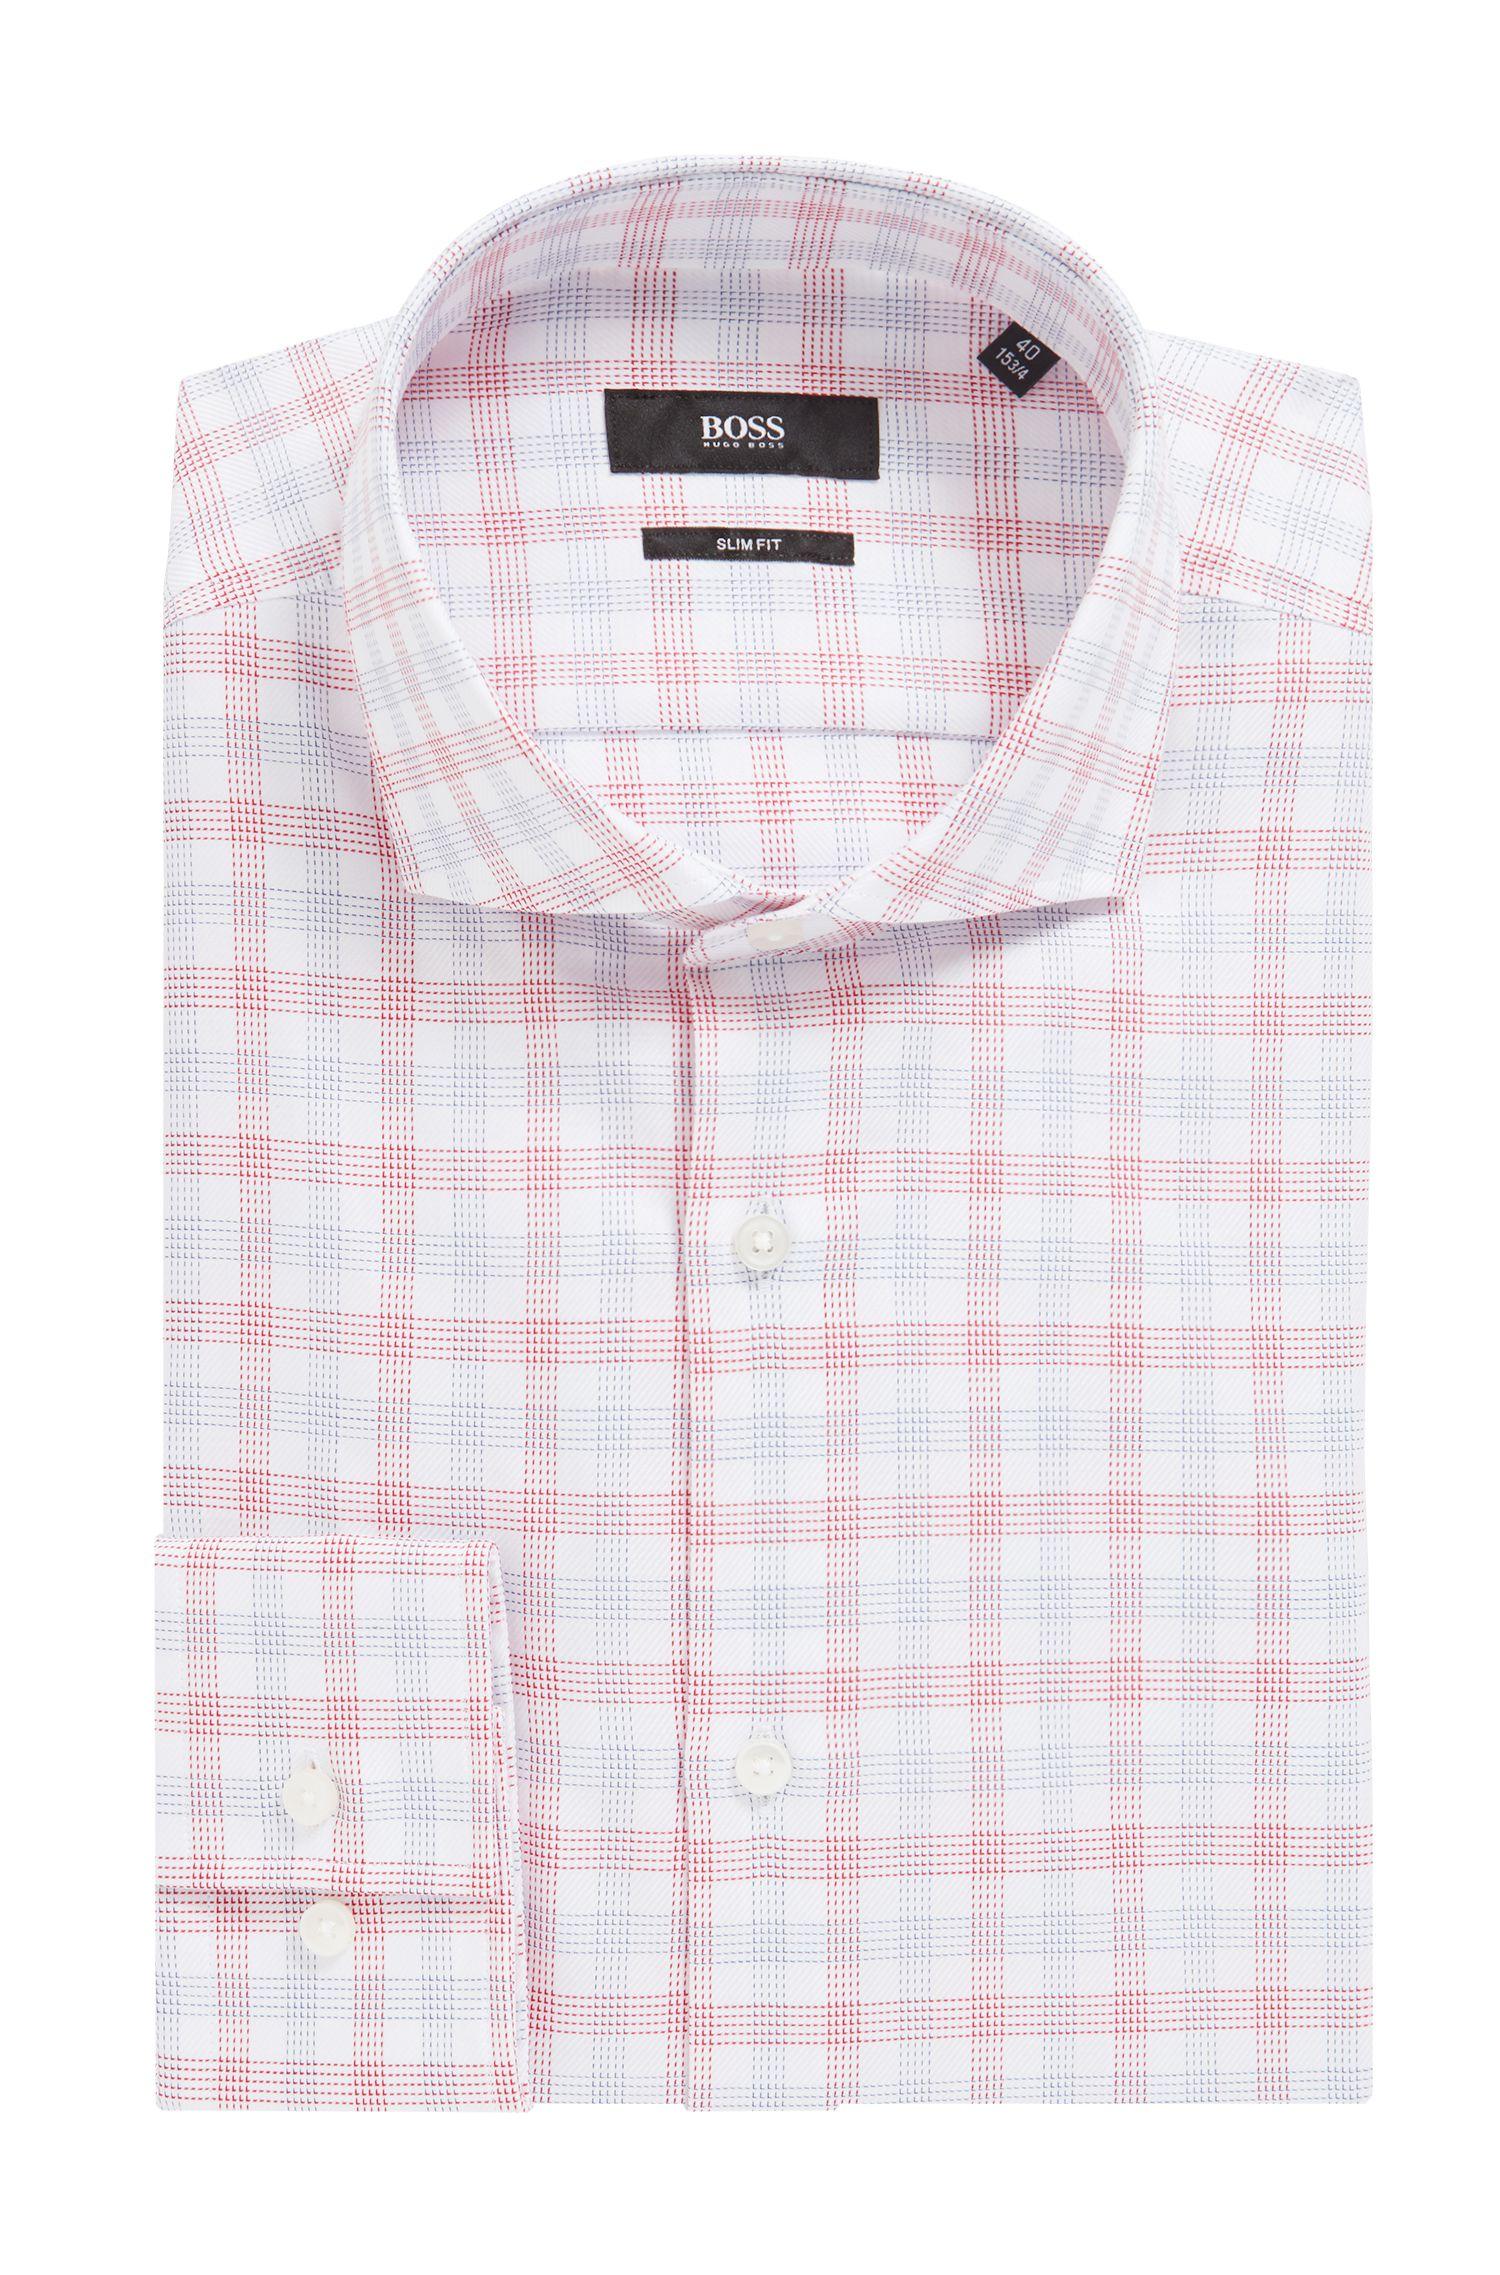 Slim-fit shirt in Vichy-checked cotton twill, Dark pink